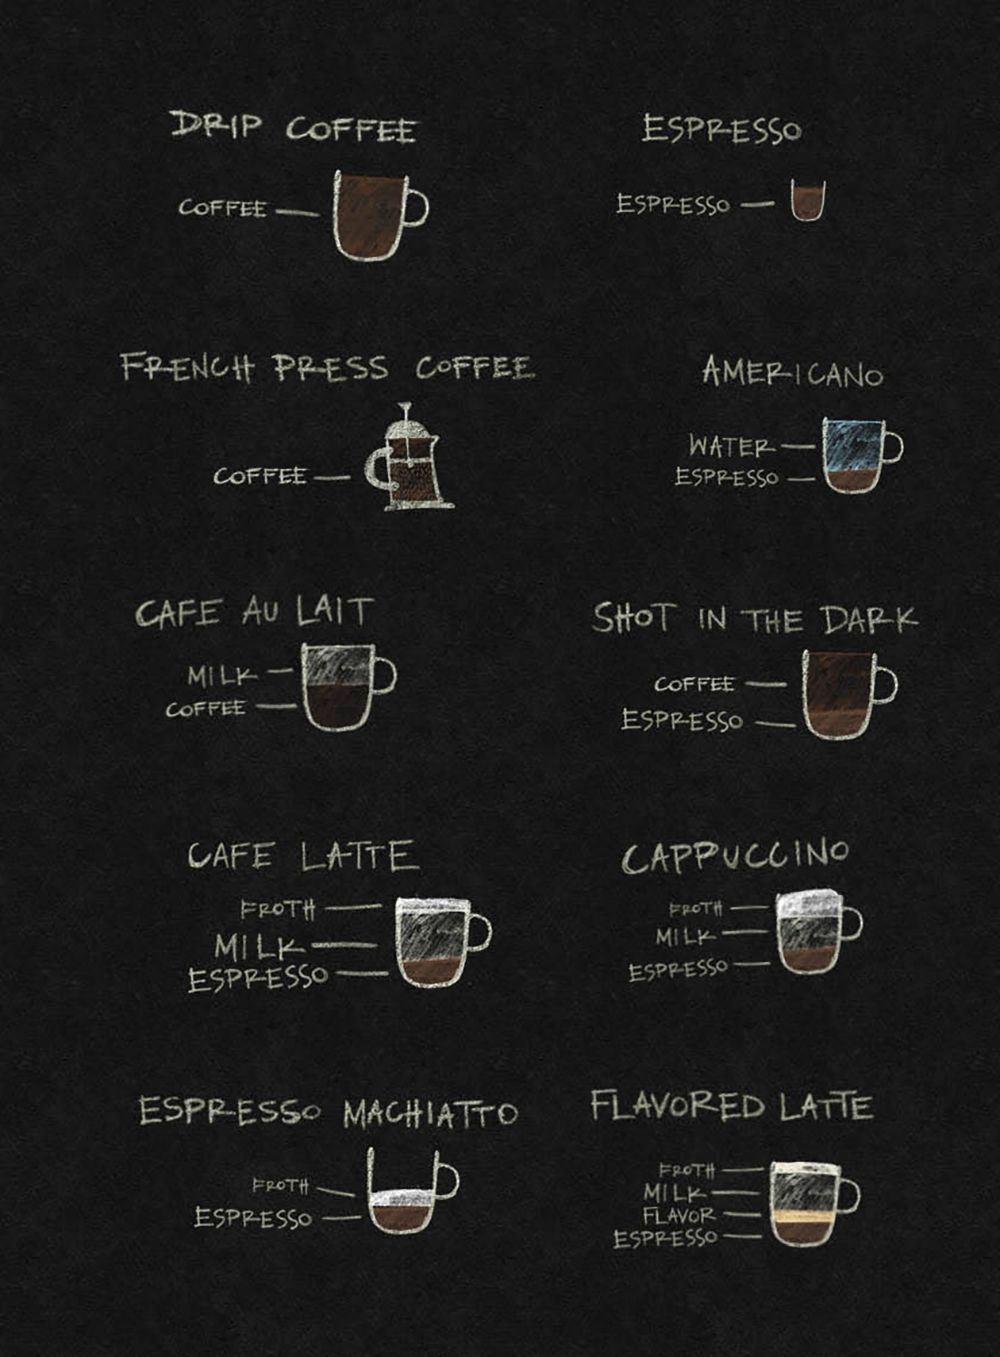 COFFEE 101 Coffee shop menu, Coffee menu, Coffee chart